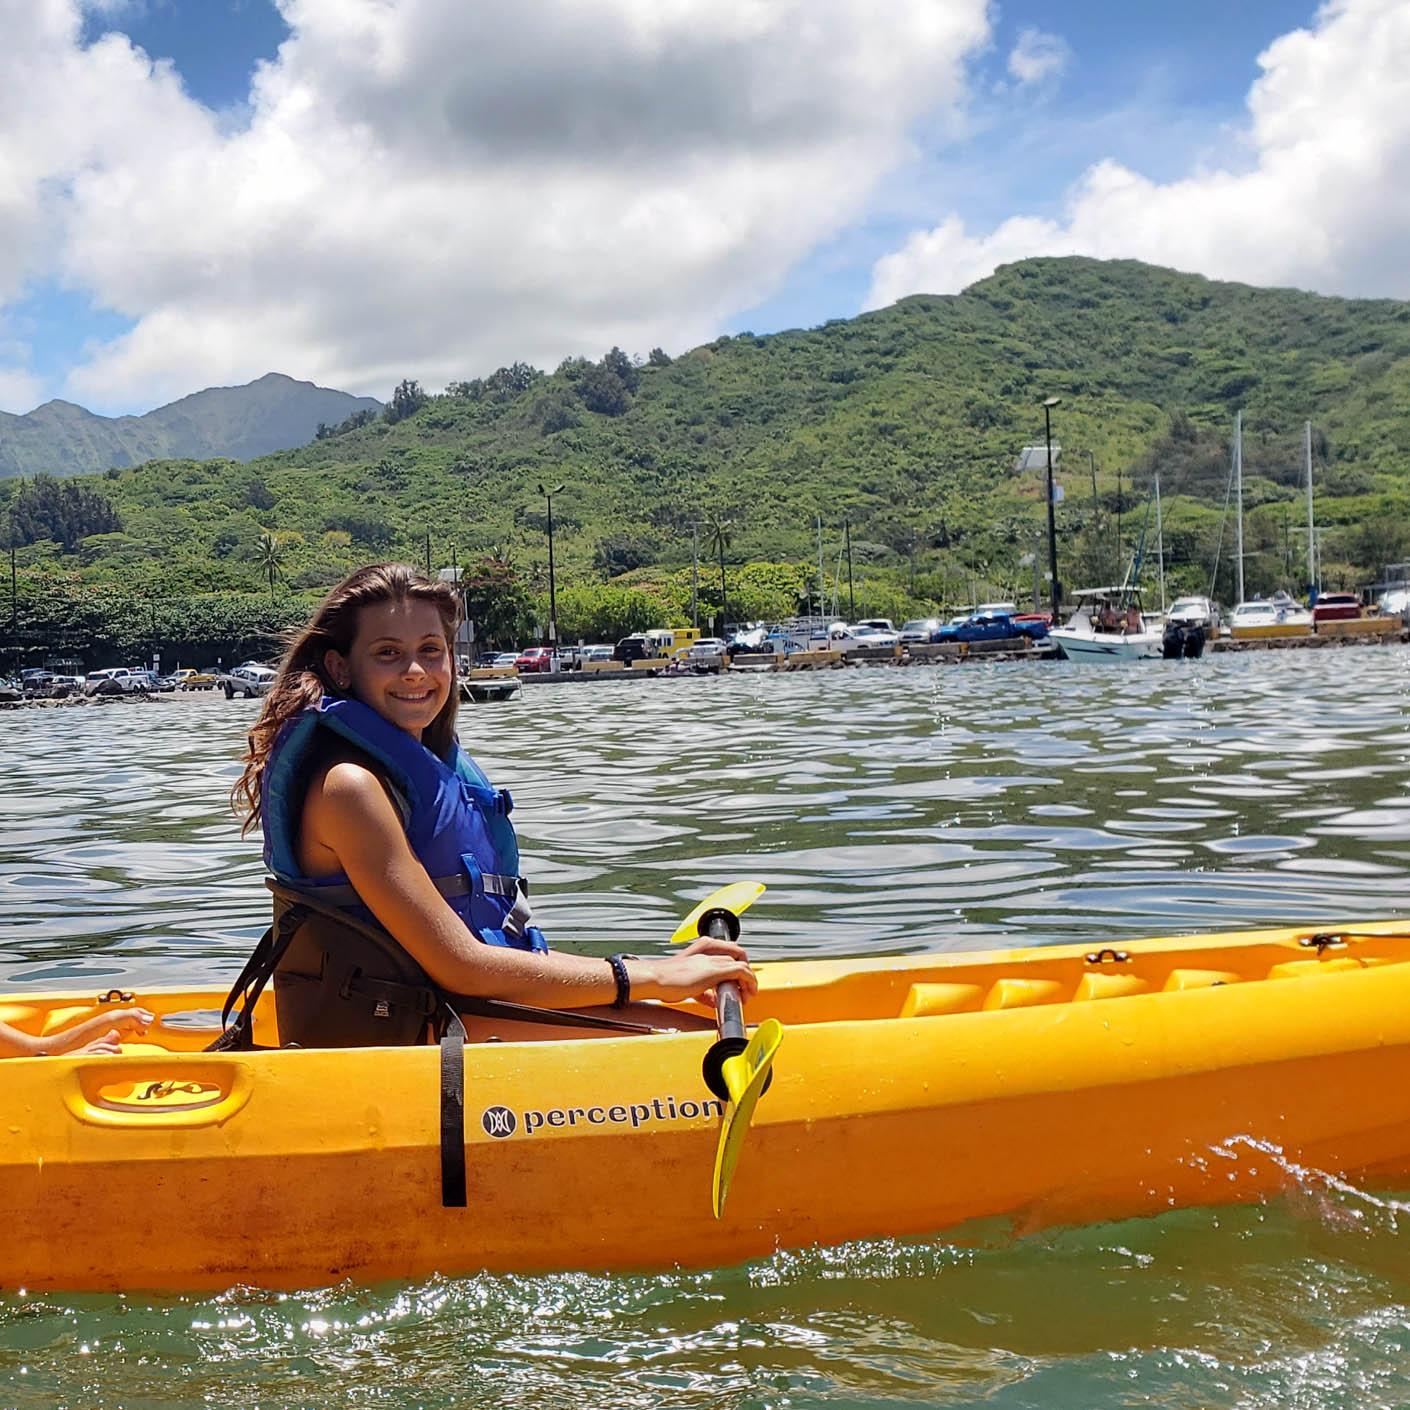 Hawaii Explorer kayaking